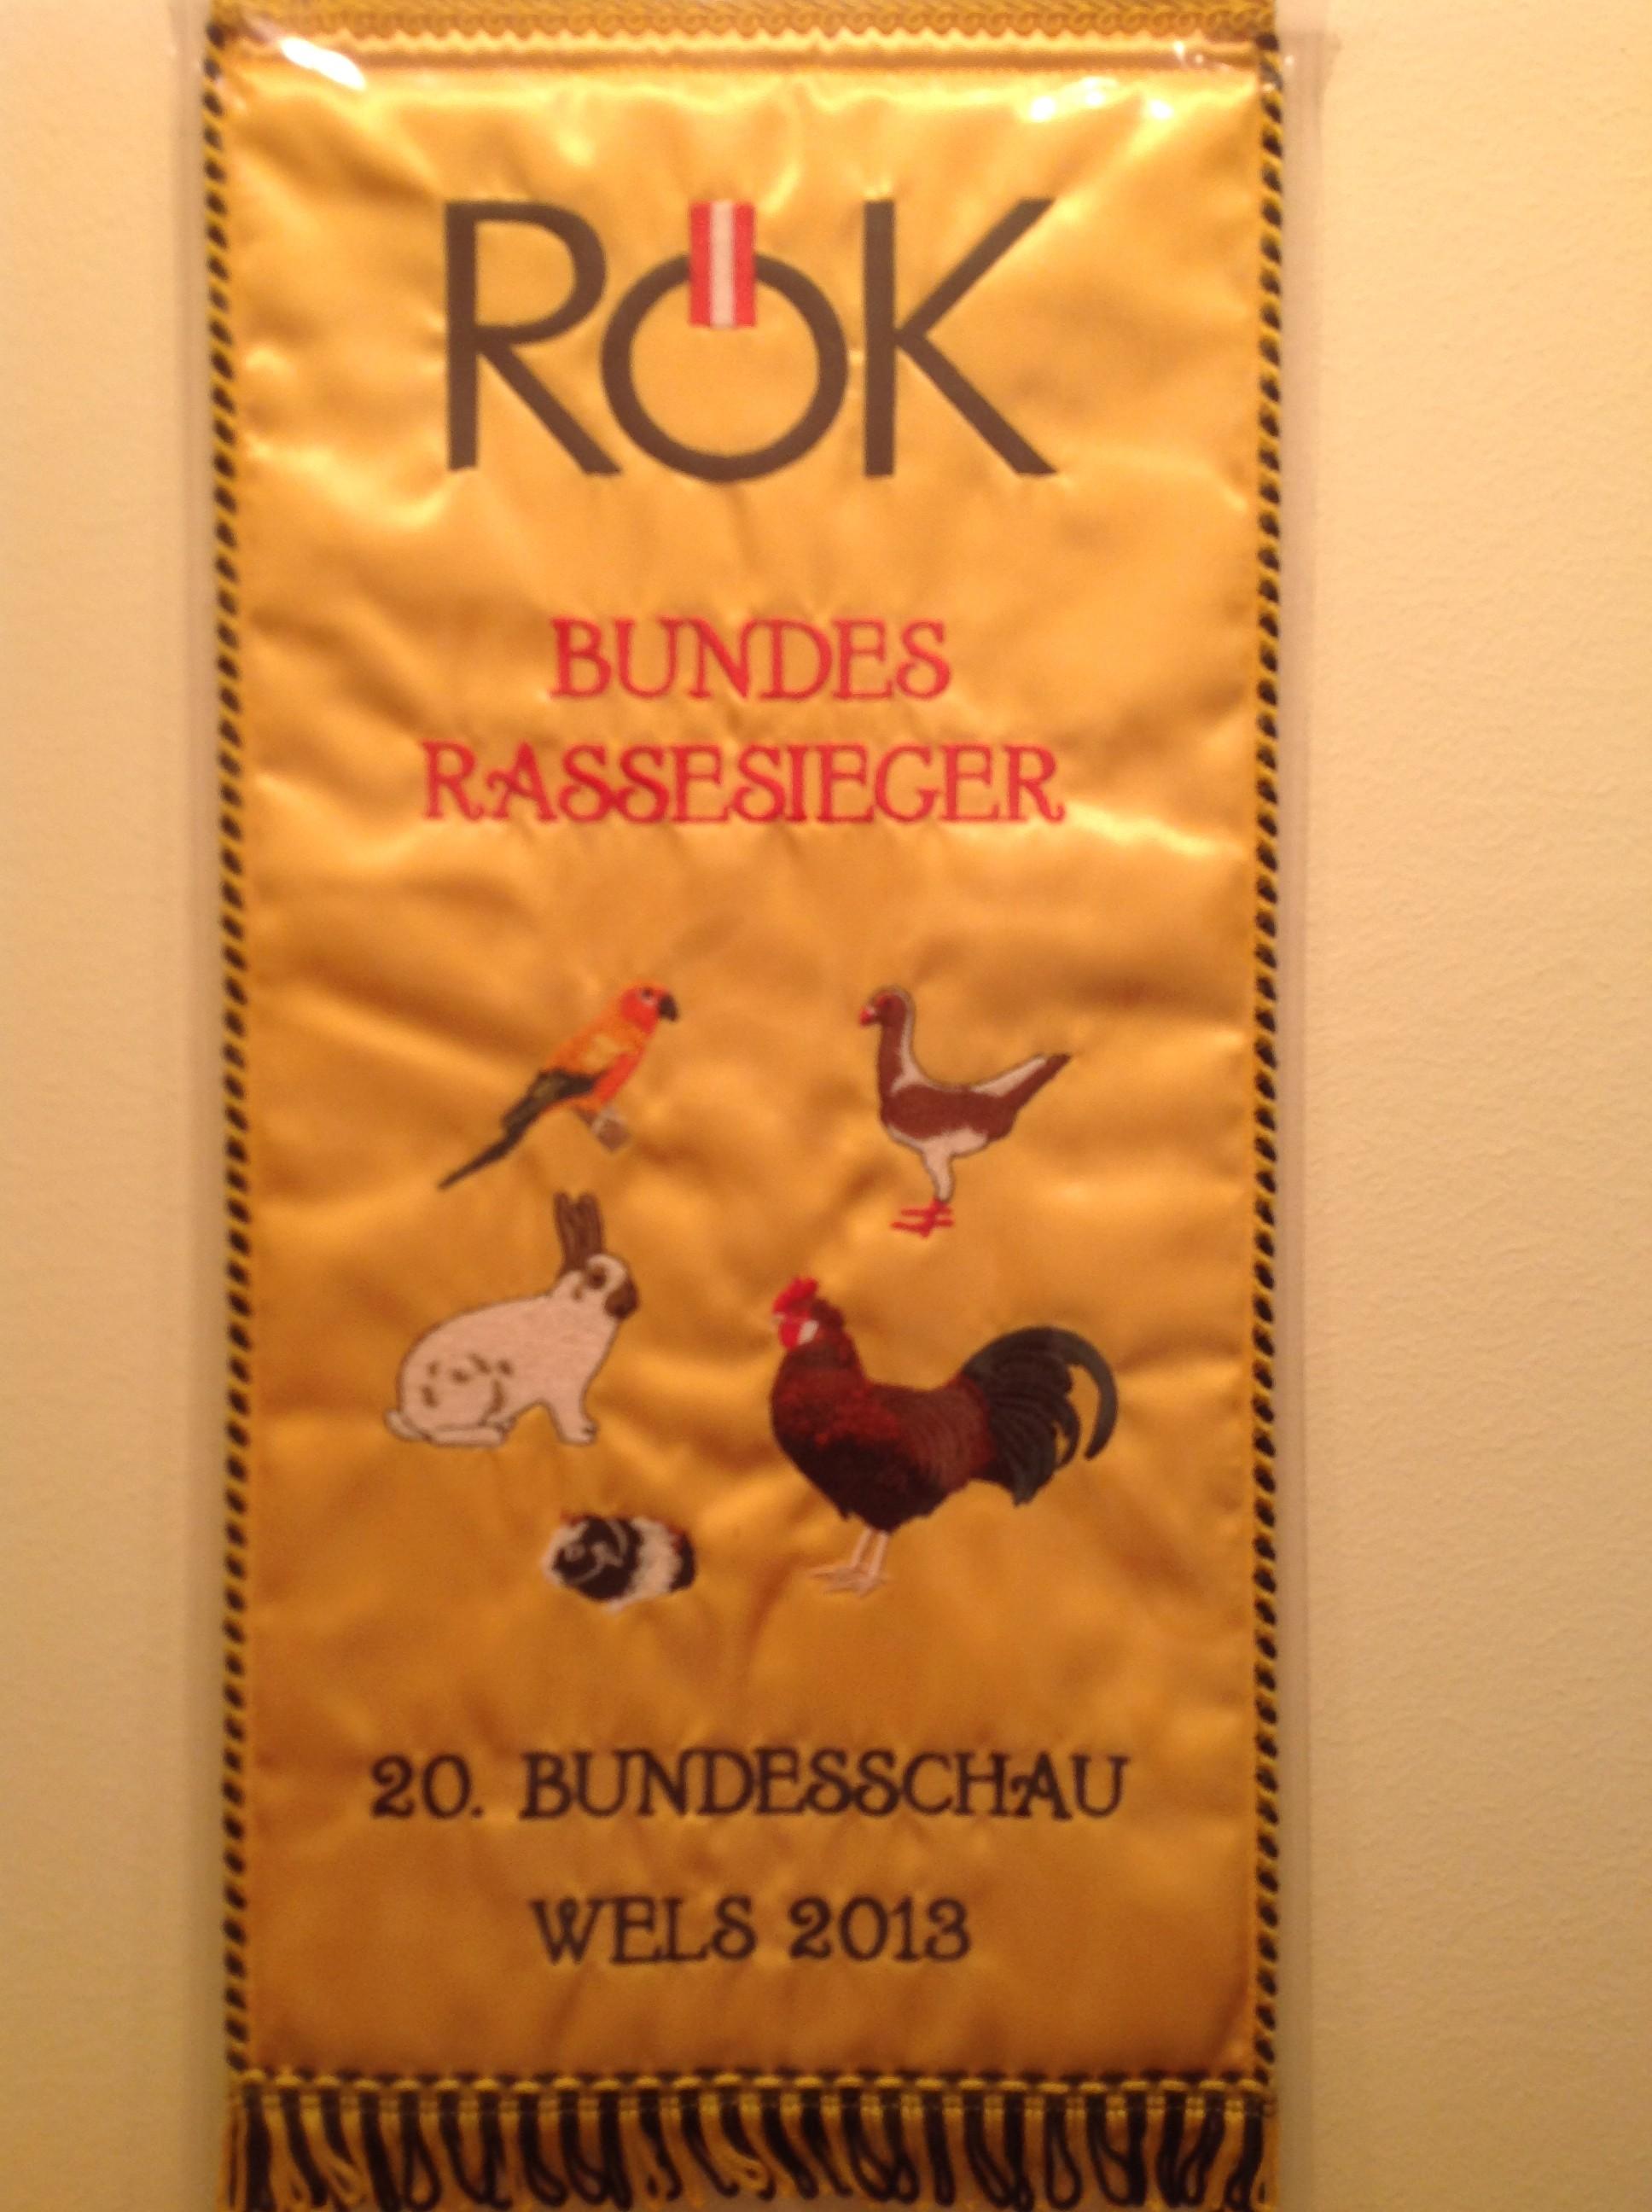 Bundesrassesieger Bundesschau Wels 2013 King braun